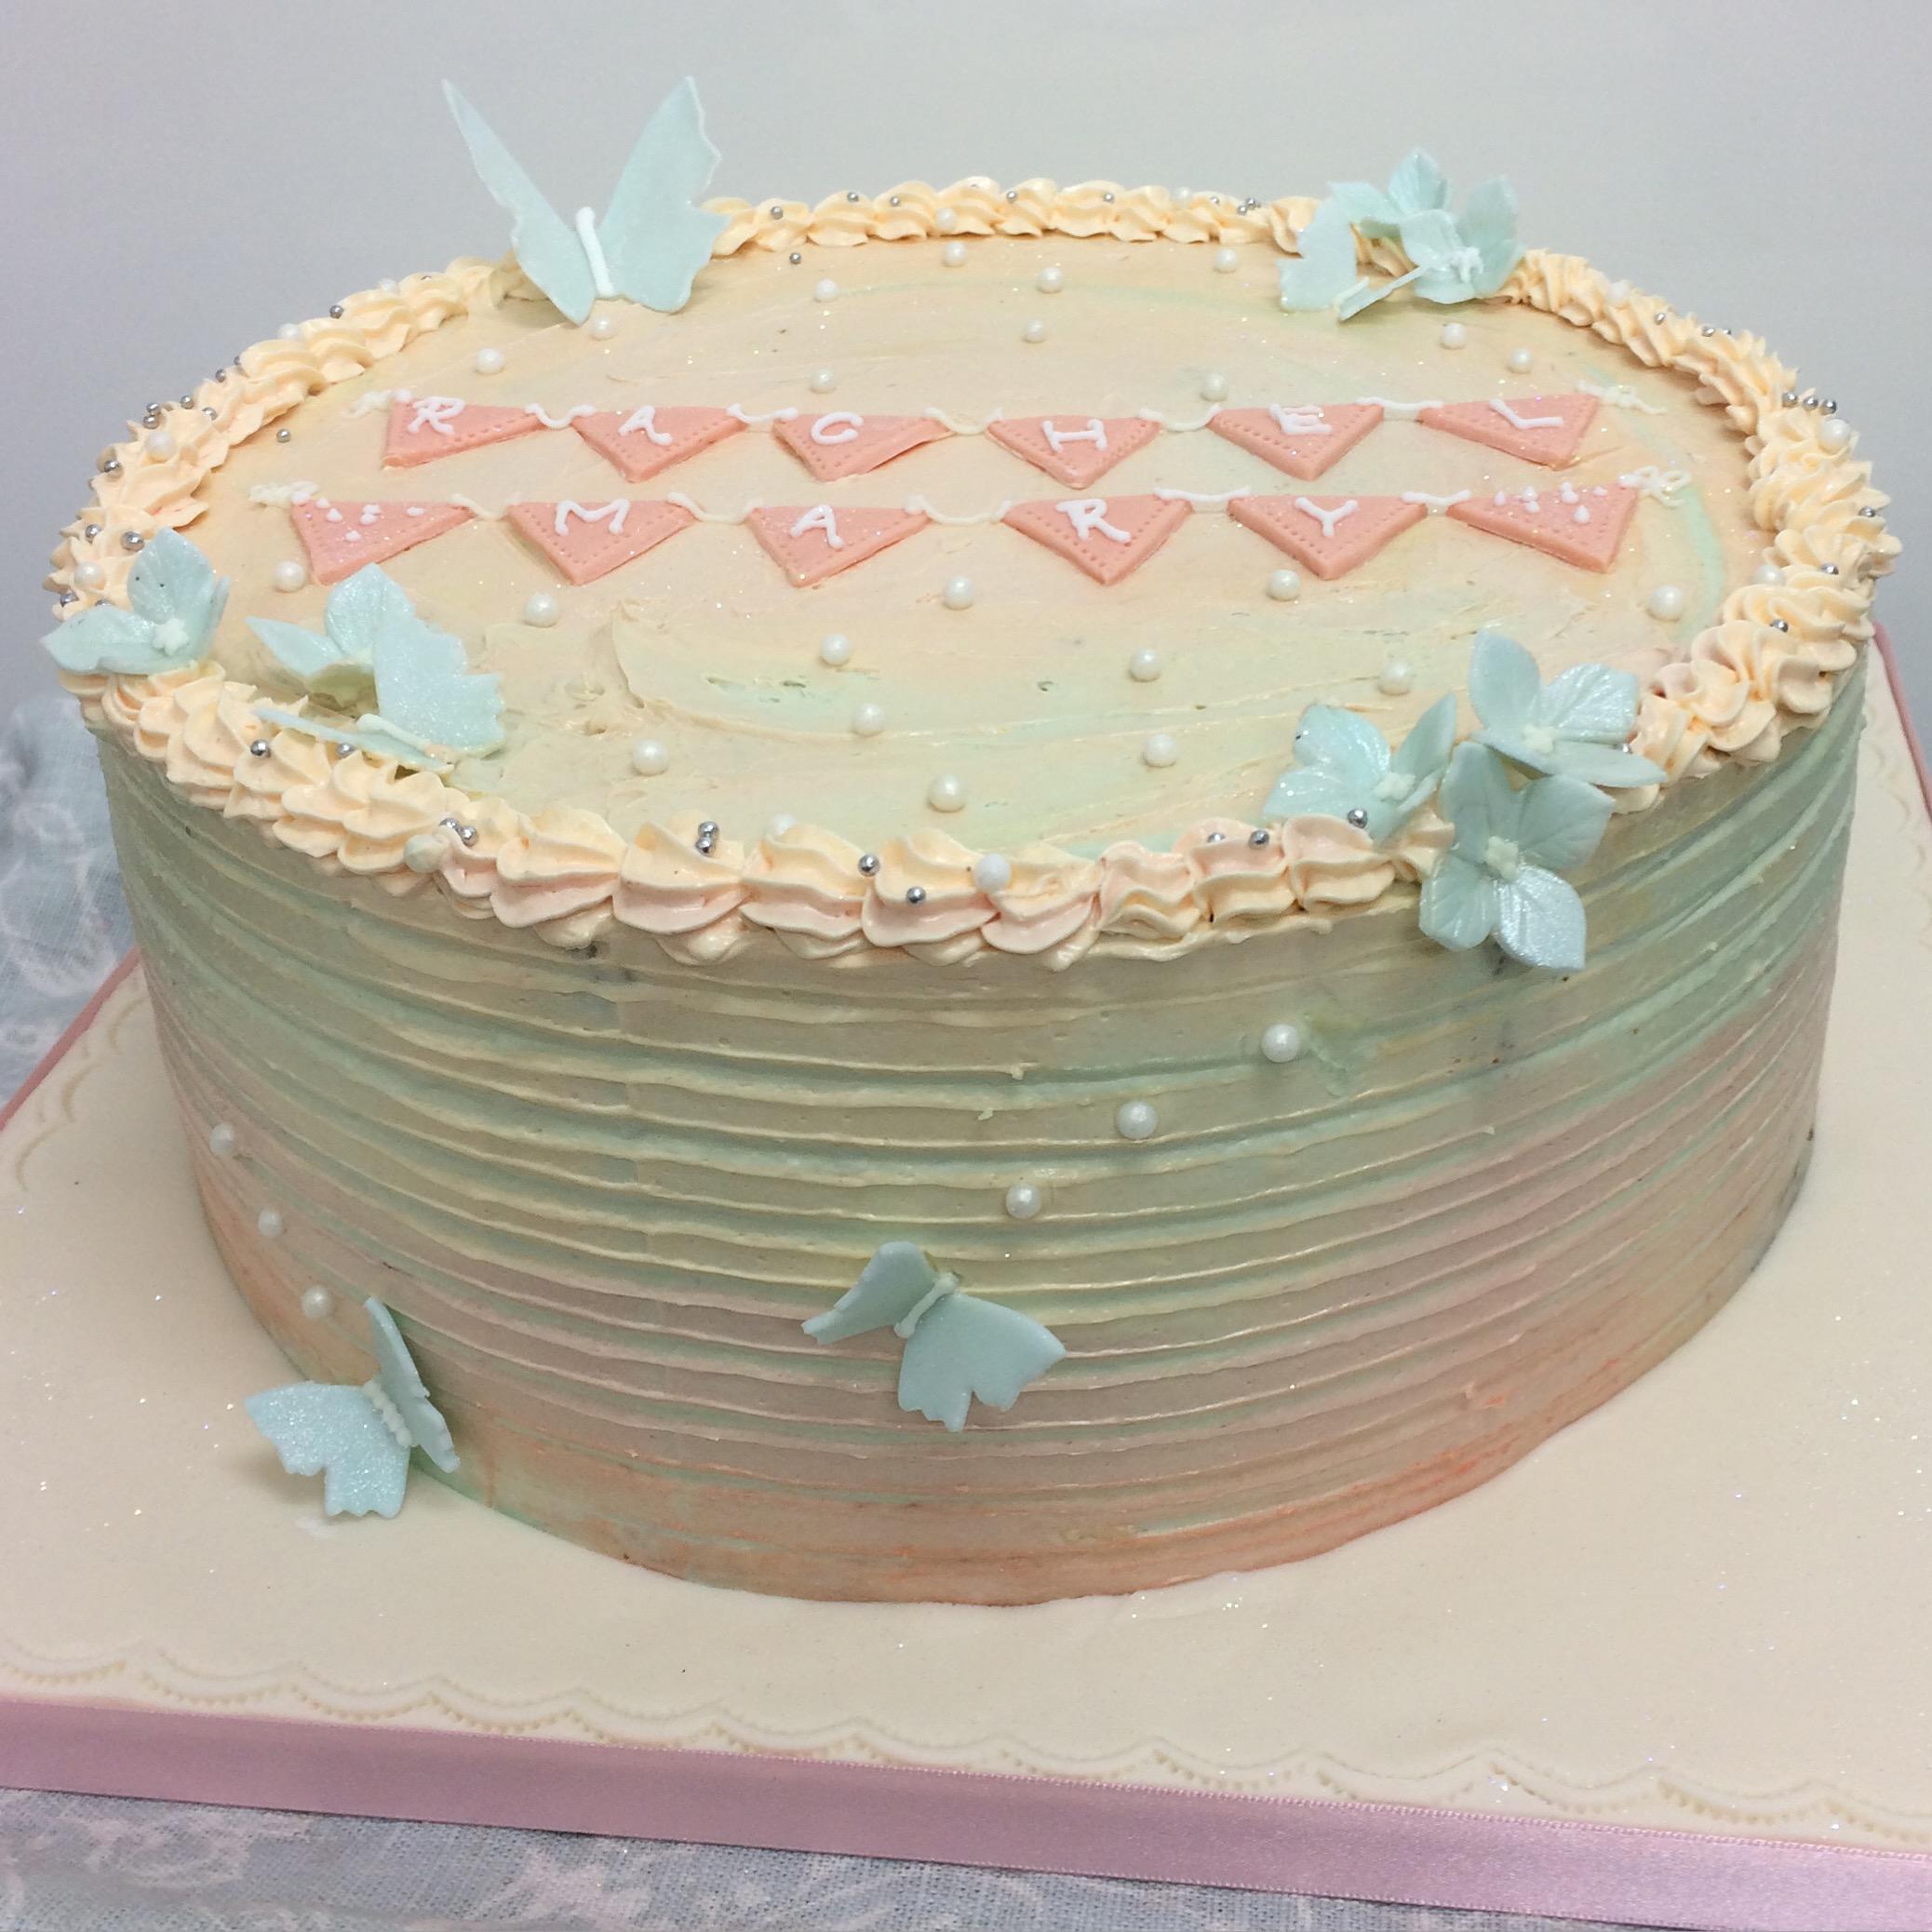 Cake pic.png